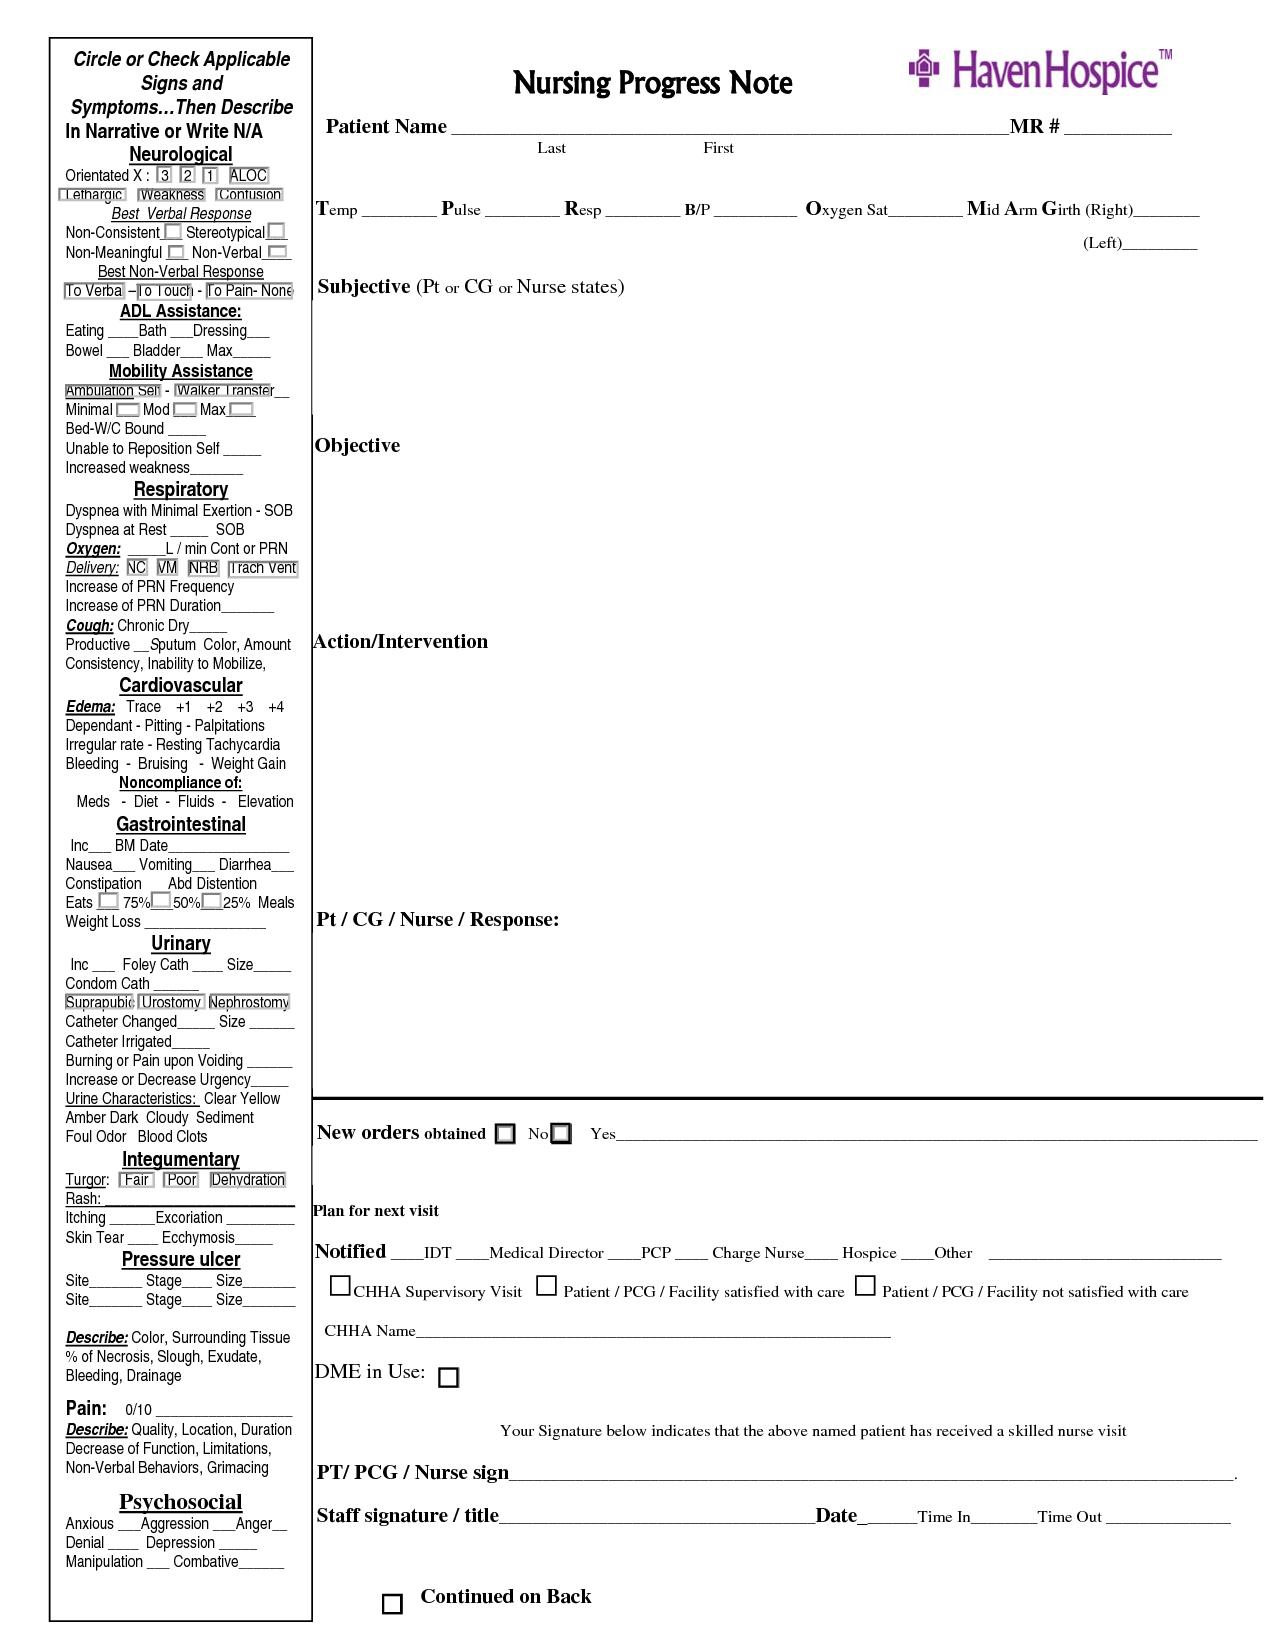 nursing notes | Nursing Progress Note | Documentation | Pinterest